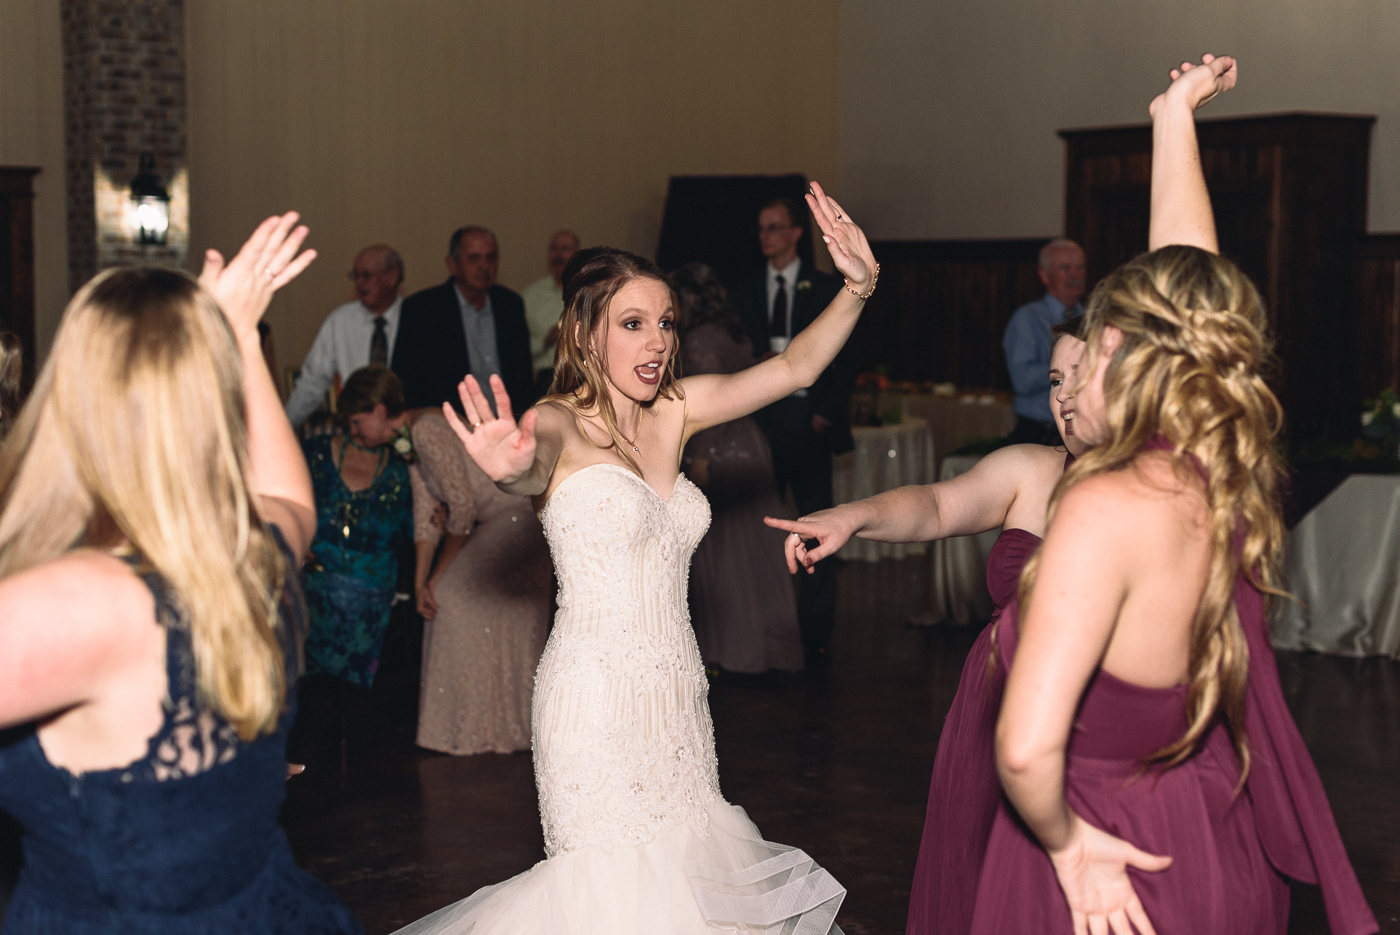 wedding reception bridal party dancing mermaid gown